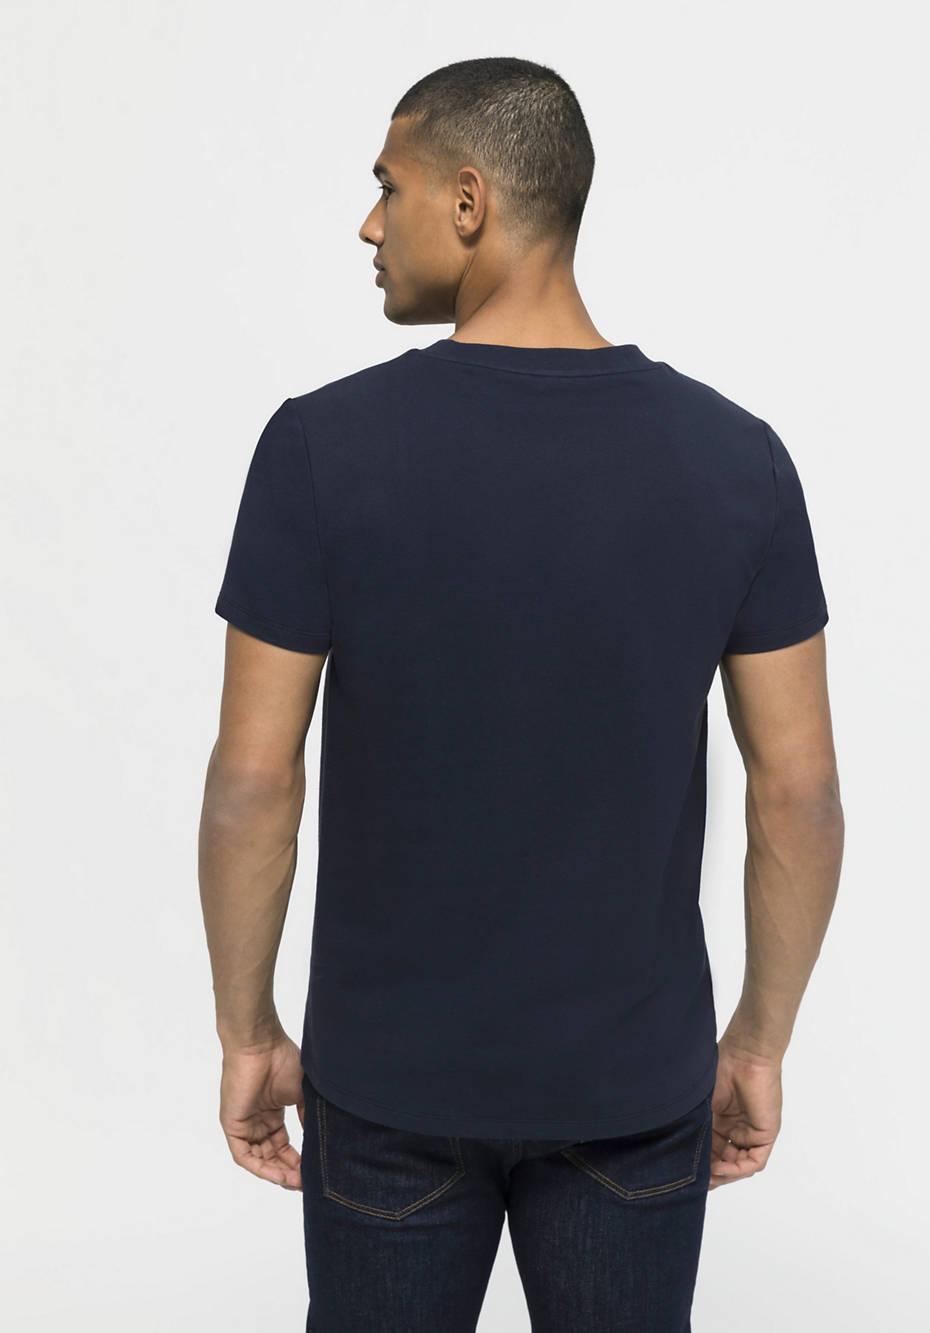 Kurzarm-Sweatshirt aus Bio-Baumwolle mit Kapok